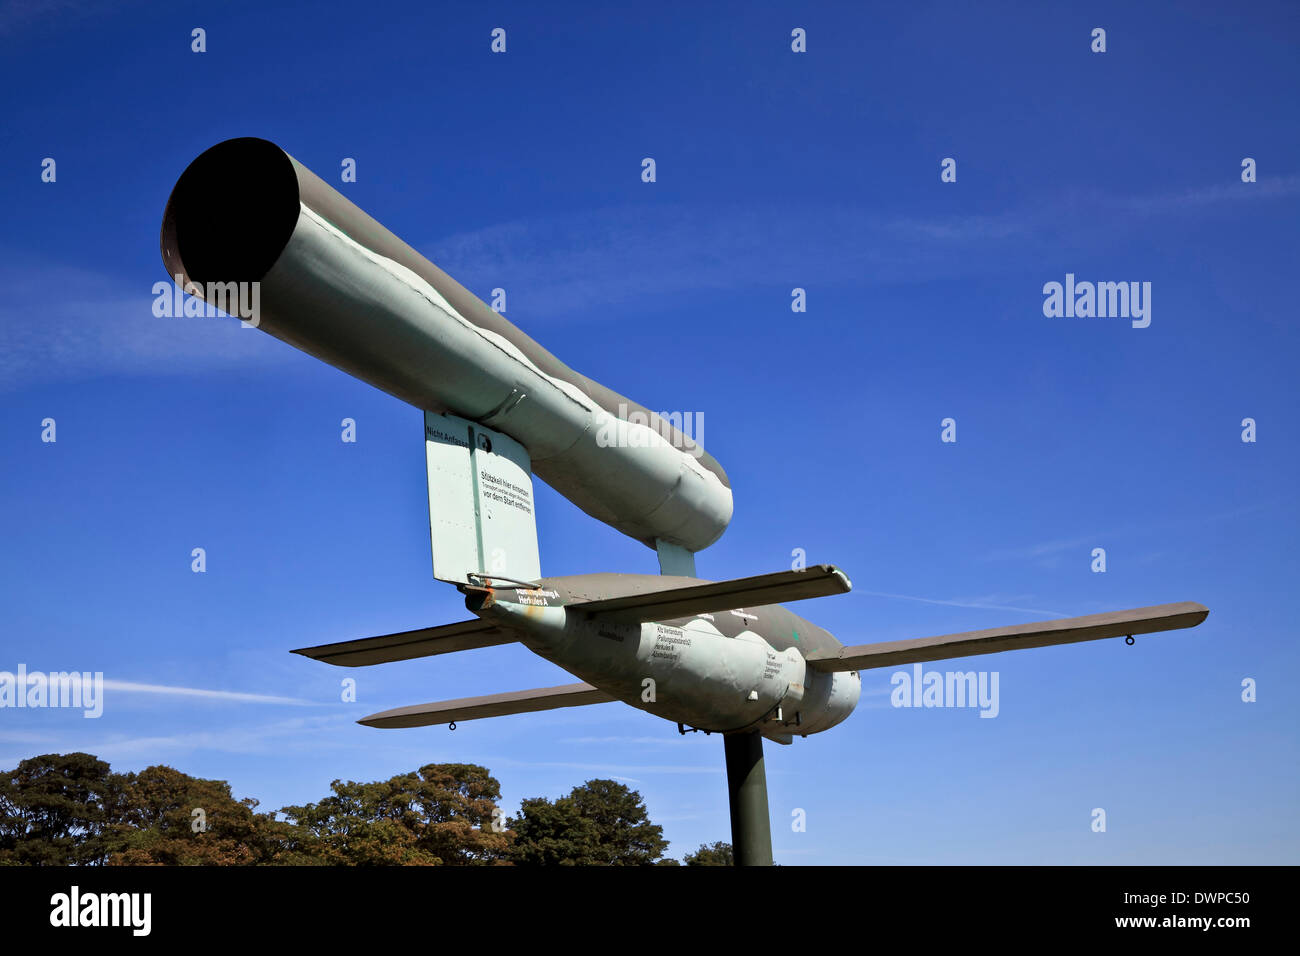 9386. WW2 German V 1 Rocket Bomb, Manston Museum, Manston Kent, England - Stock Image